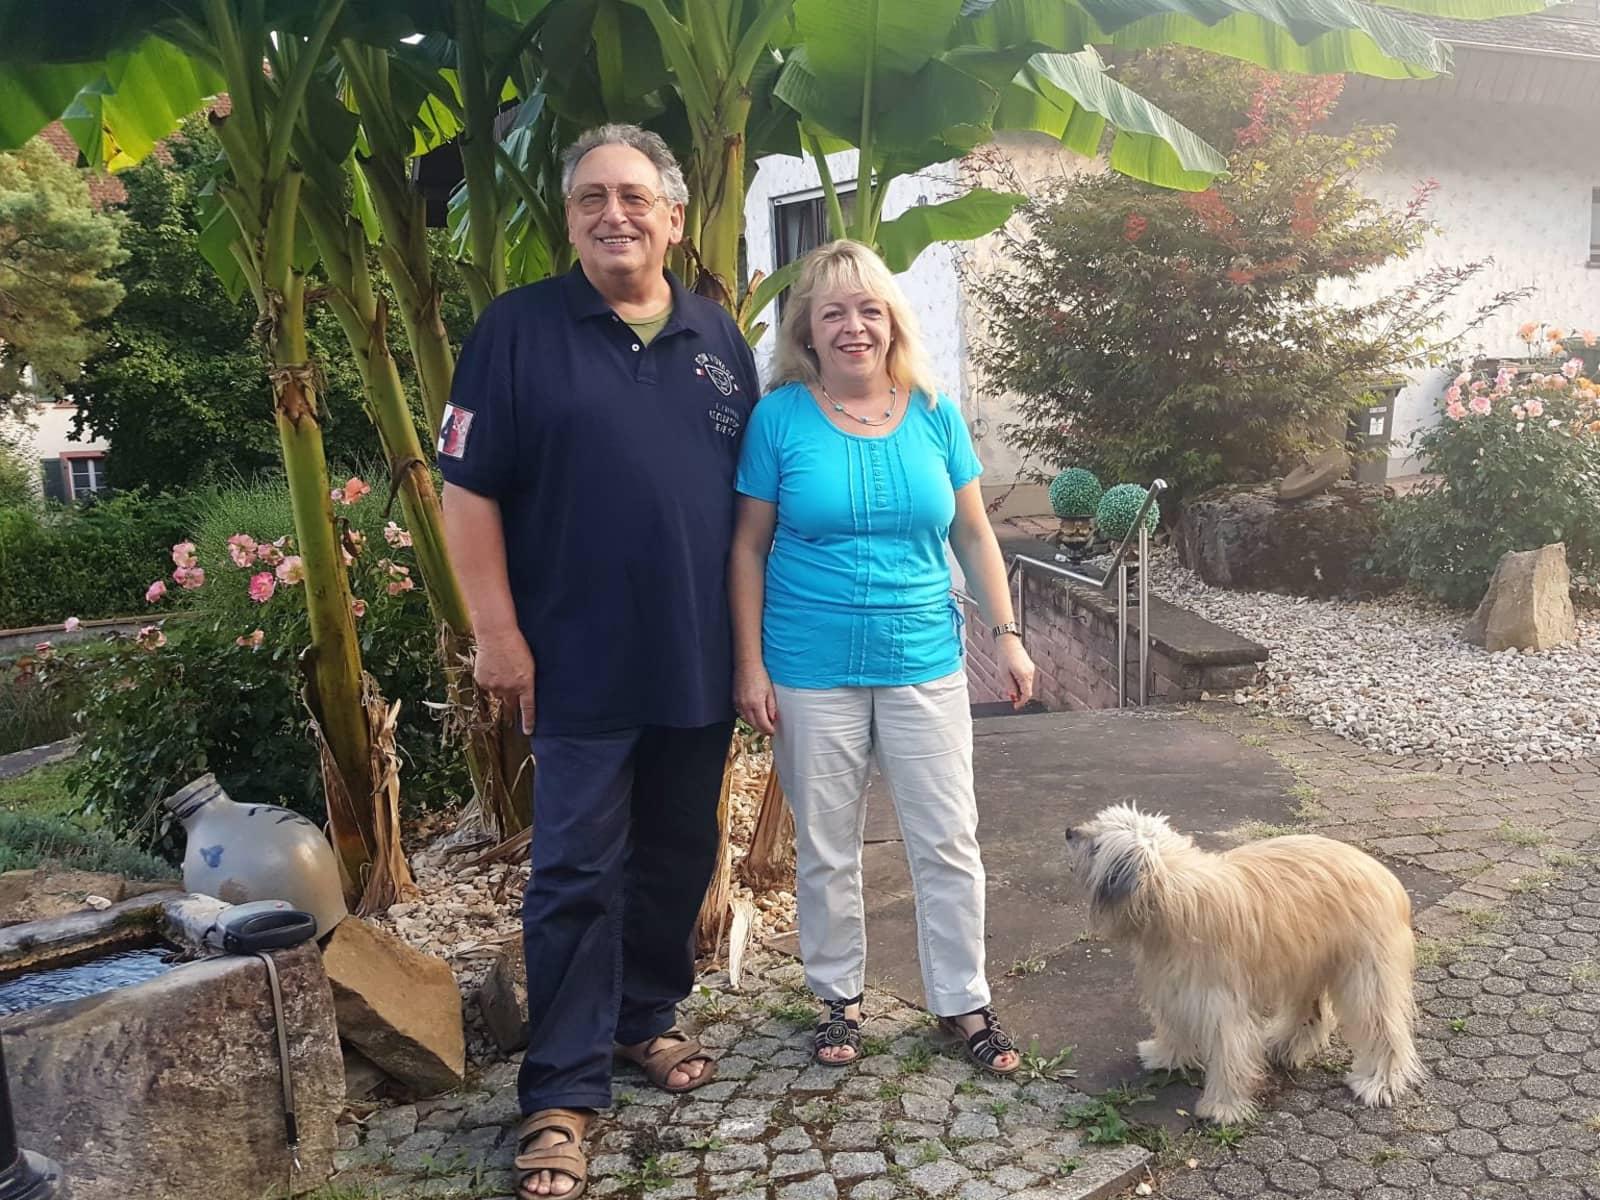 Ilse & Raymond from Sulzburg, Germany